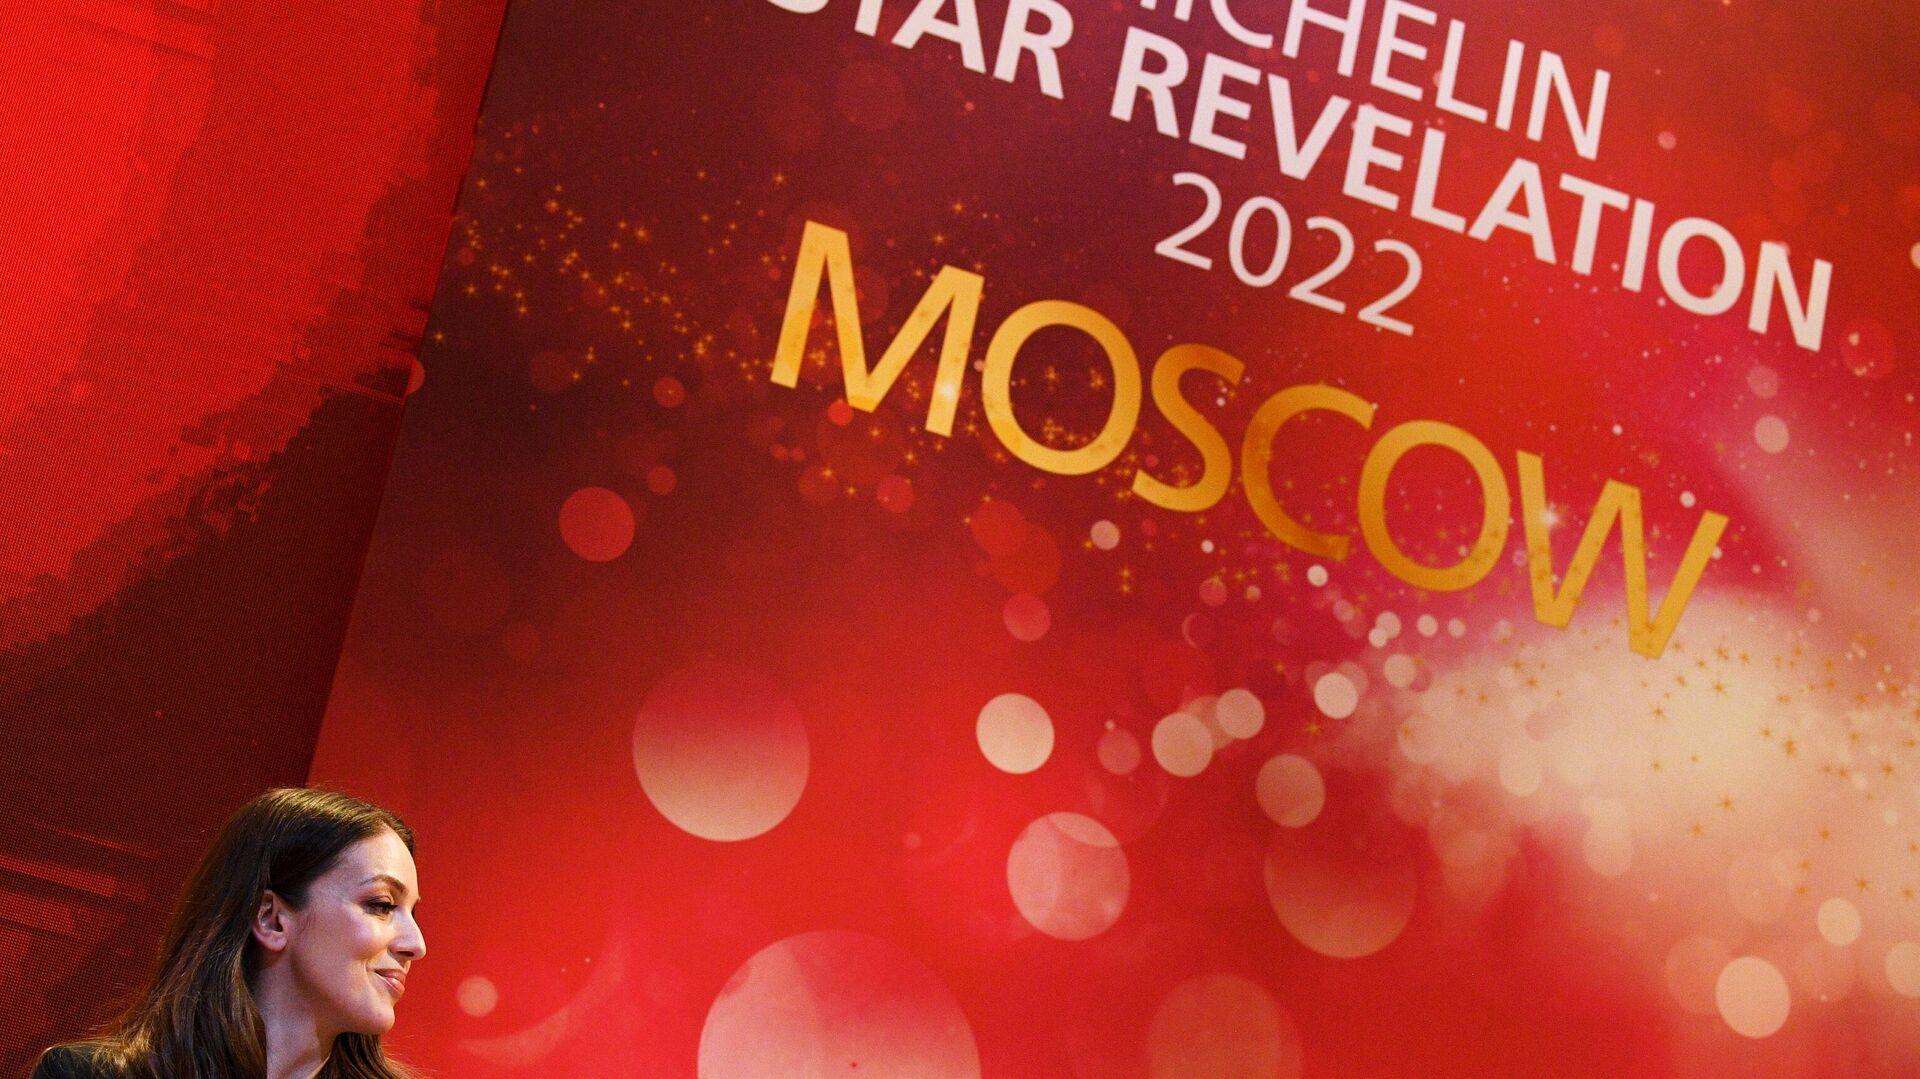 1754618871 0:322:3070:2048 1920x0 80 0 0 6157ca9bfe5280f2dece4fad79d745de - Два ресторана Москвы получили по две звезды Michelin: Artest-Chef's Table и Twins Garden